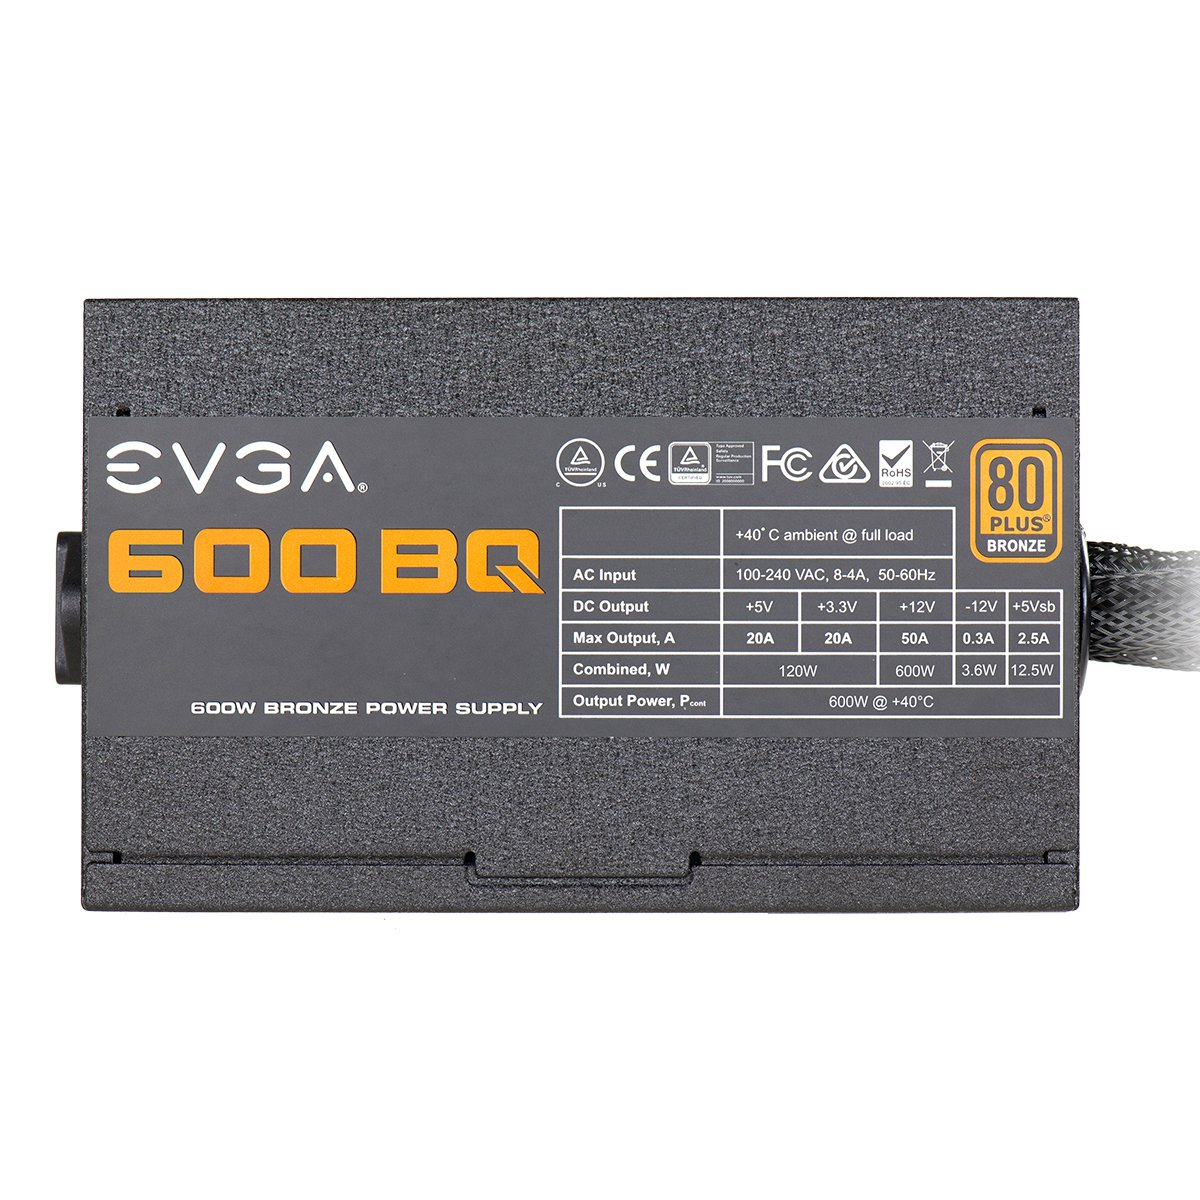 EVGA 600 BQ, 80+ Bronze 600W, Semi Modular, FDB Fan, 3 Year Warranty, Power Supply 110-BQ-0600-K1 by EVGA (Image #6)